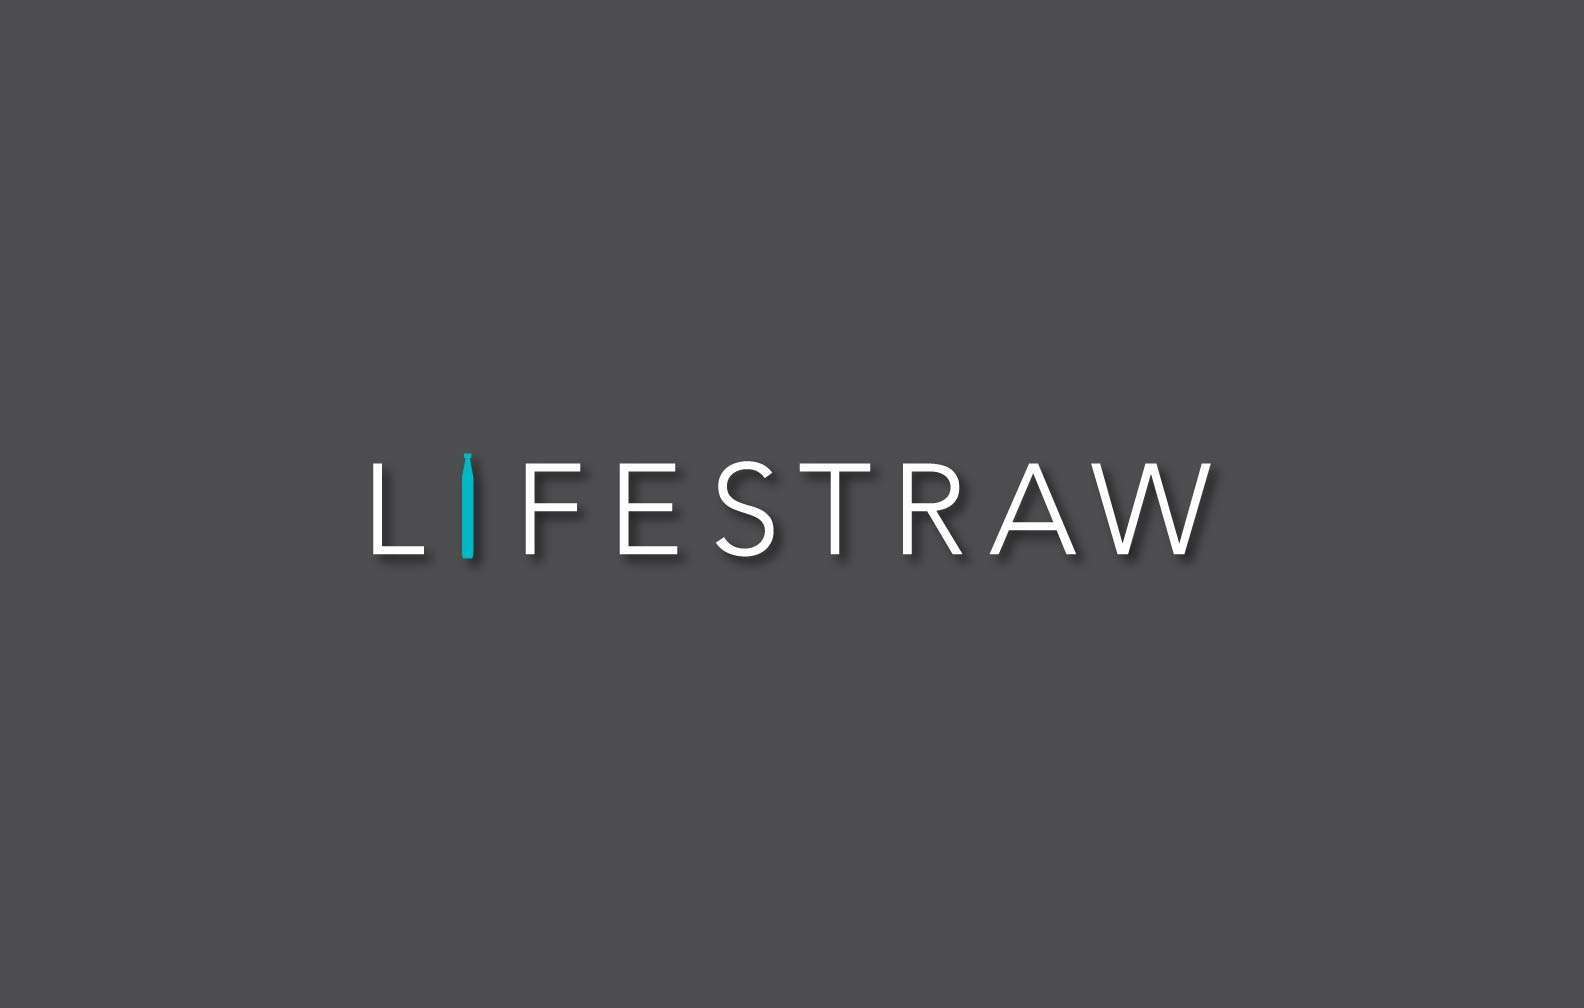 lifestraw.jpg